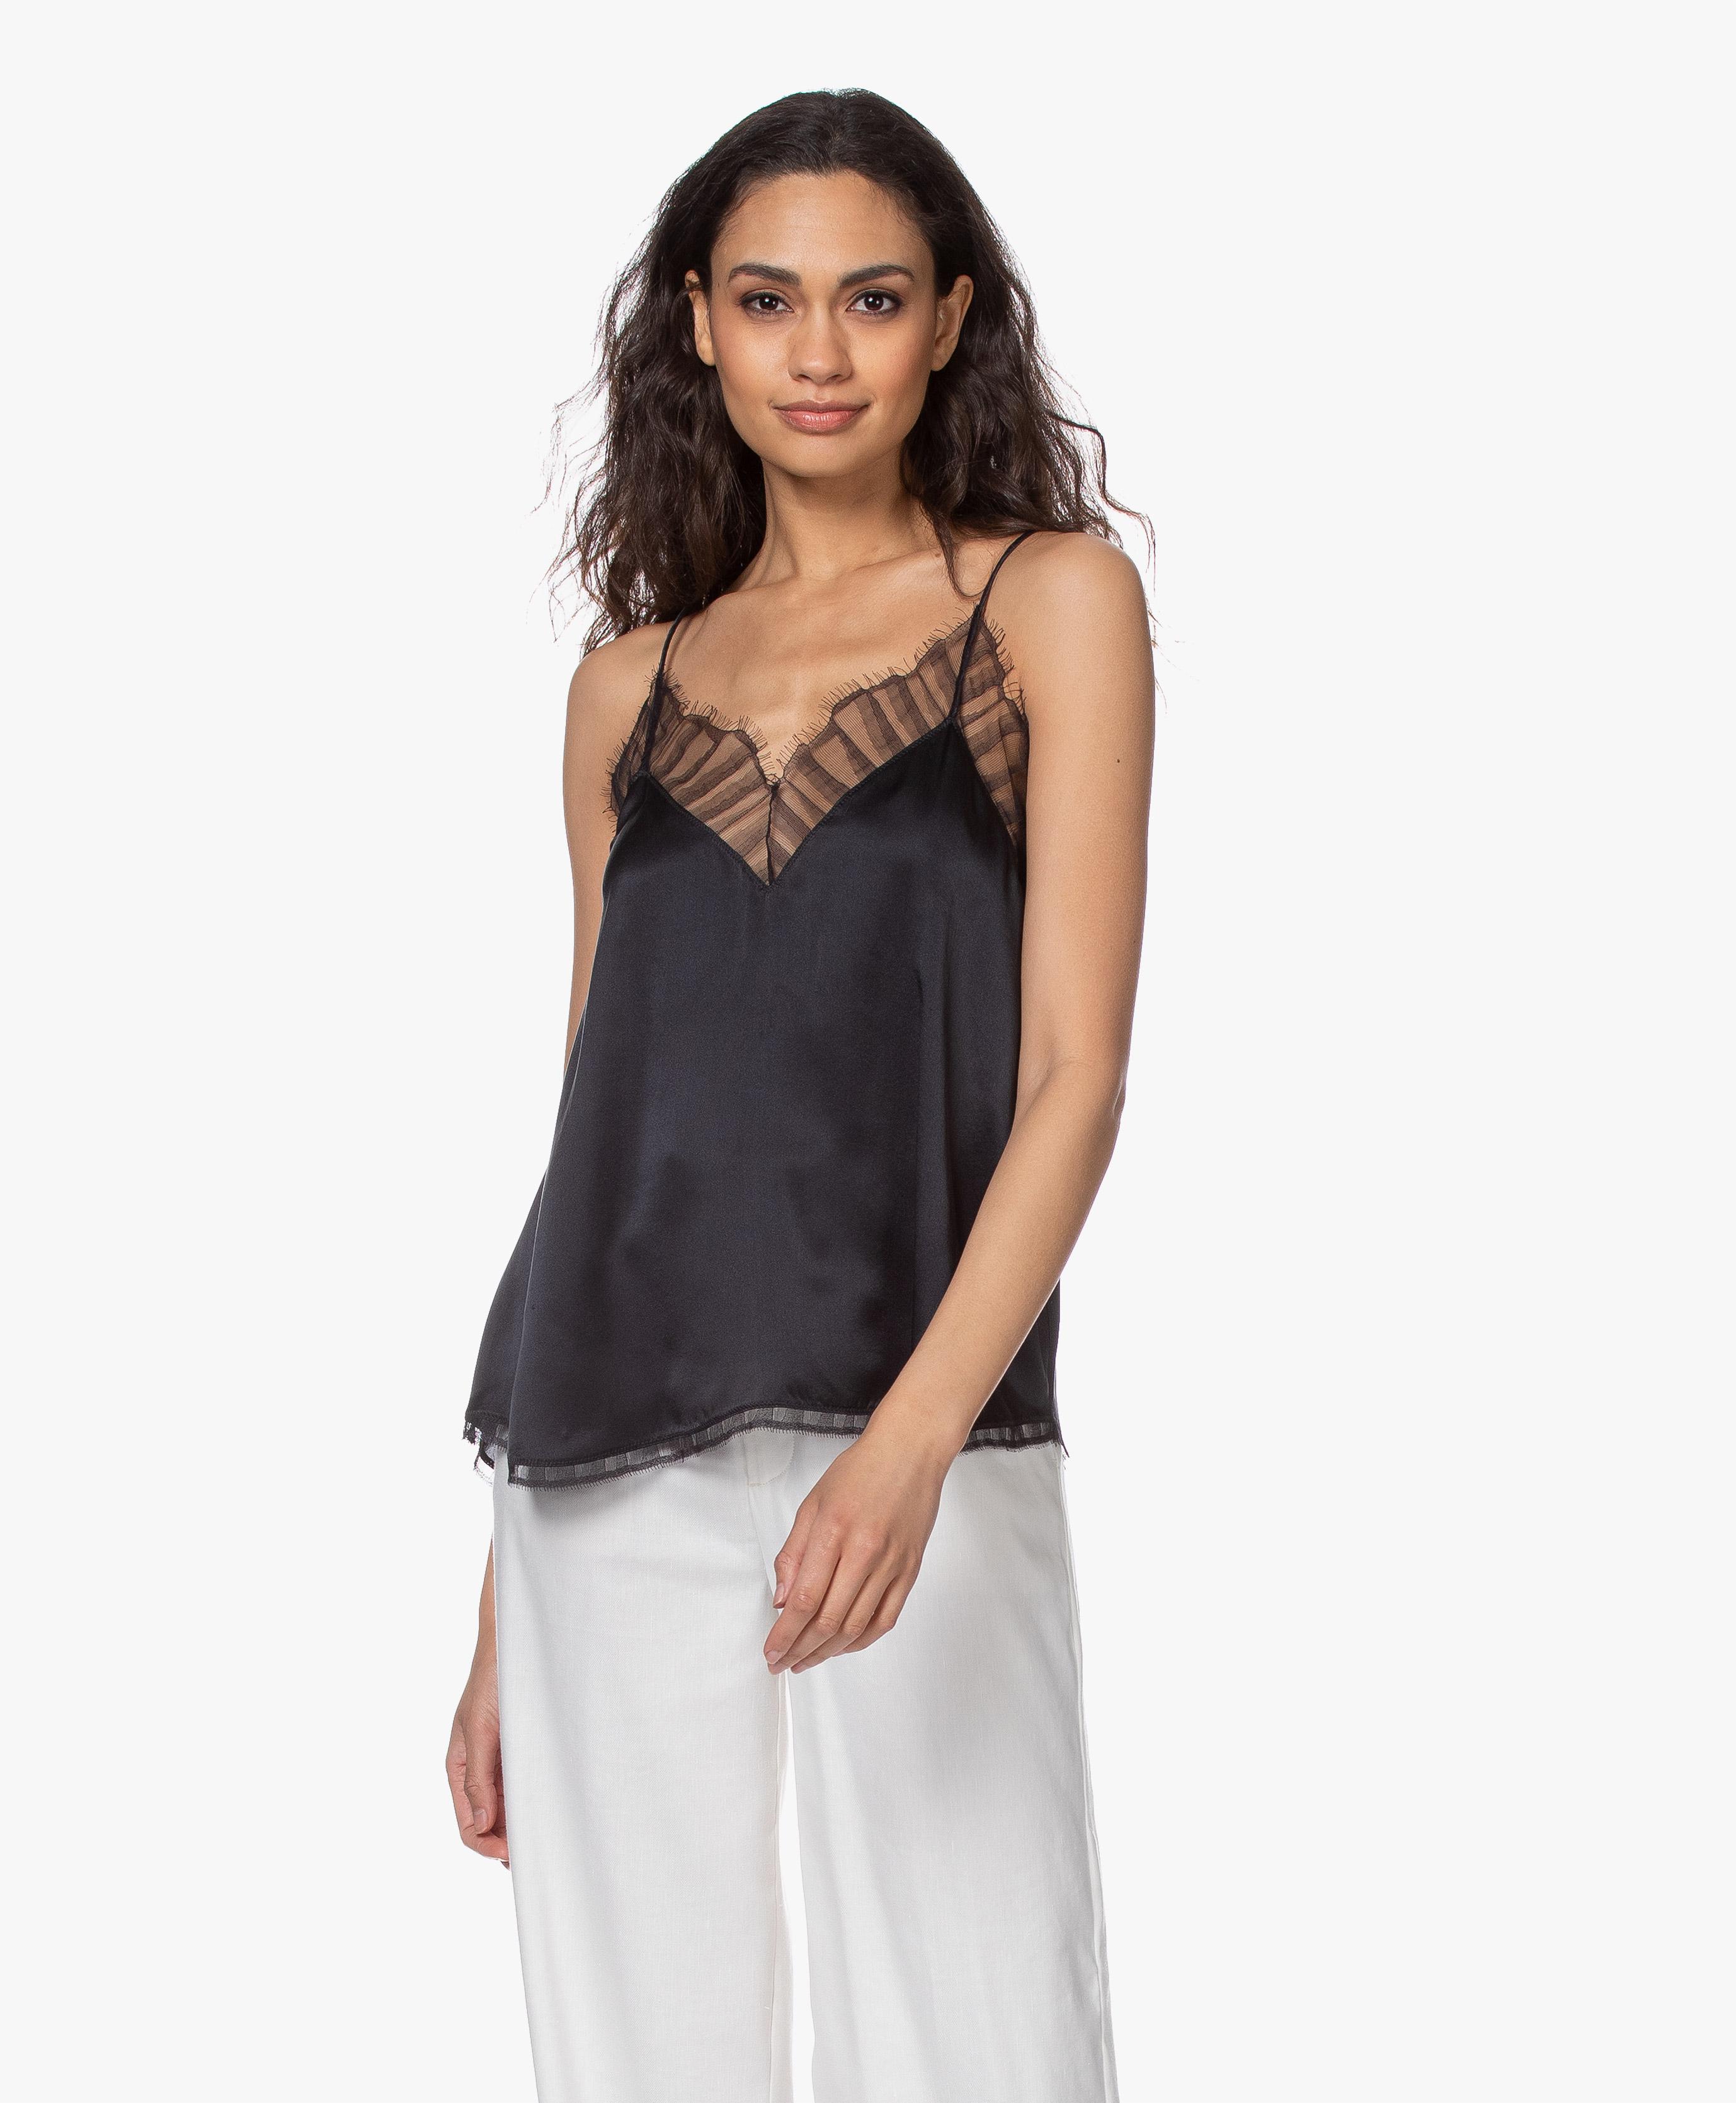 100/% Silk Delicate Feminine Cami Pale Pink Sequin Lace Tank Top